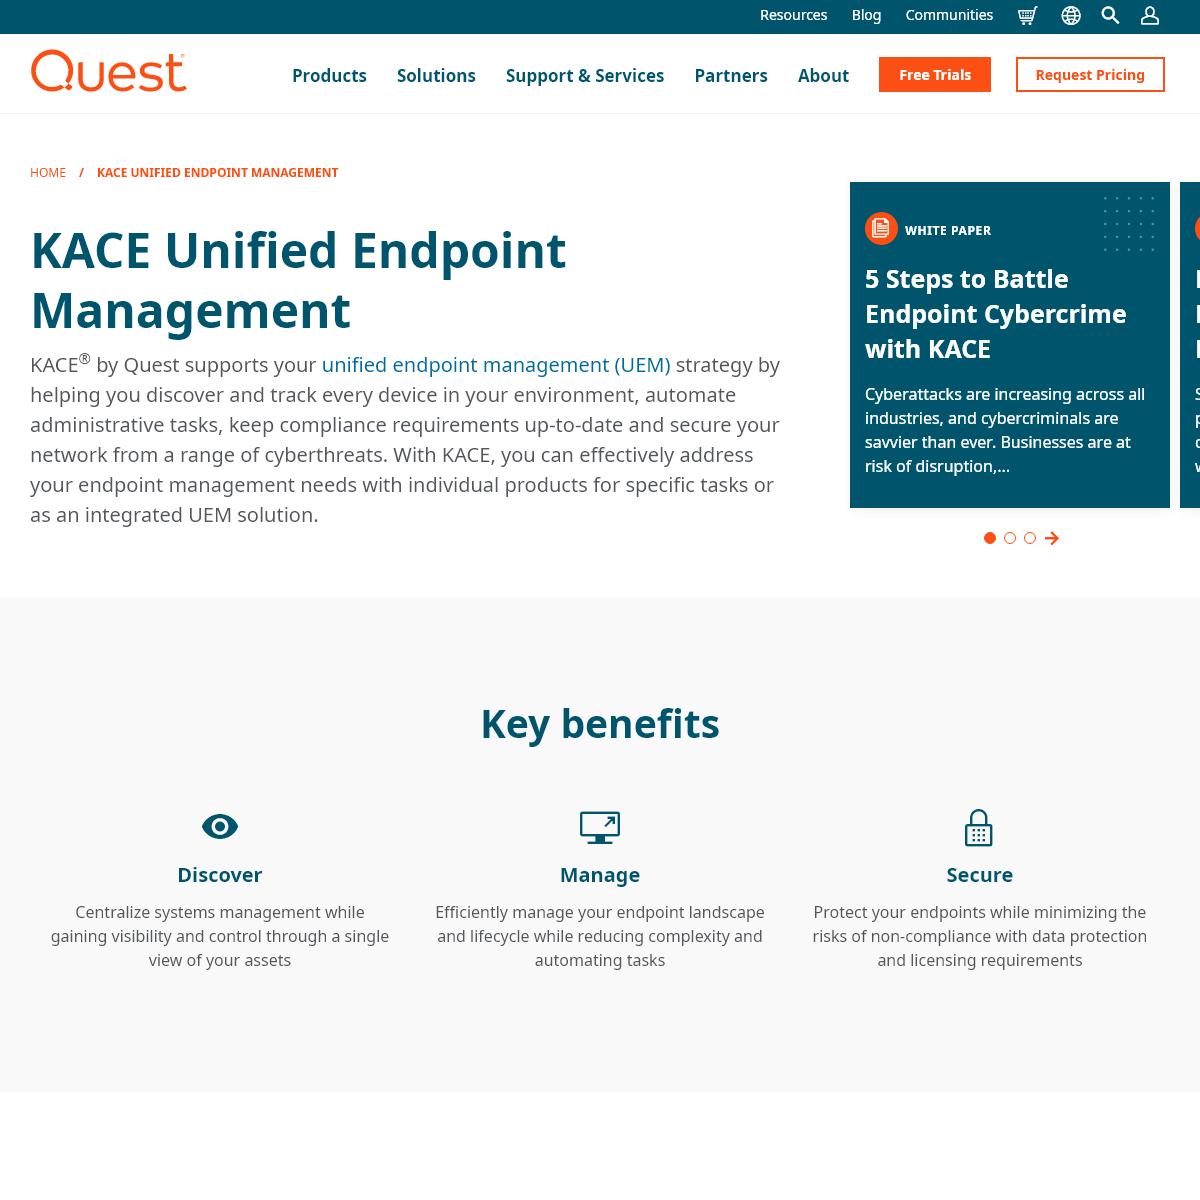 Endpoint Management - KACE by Quest